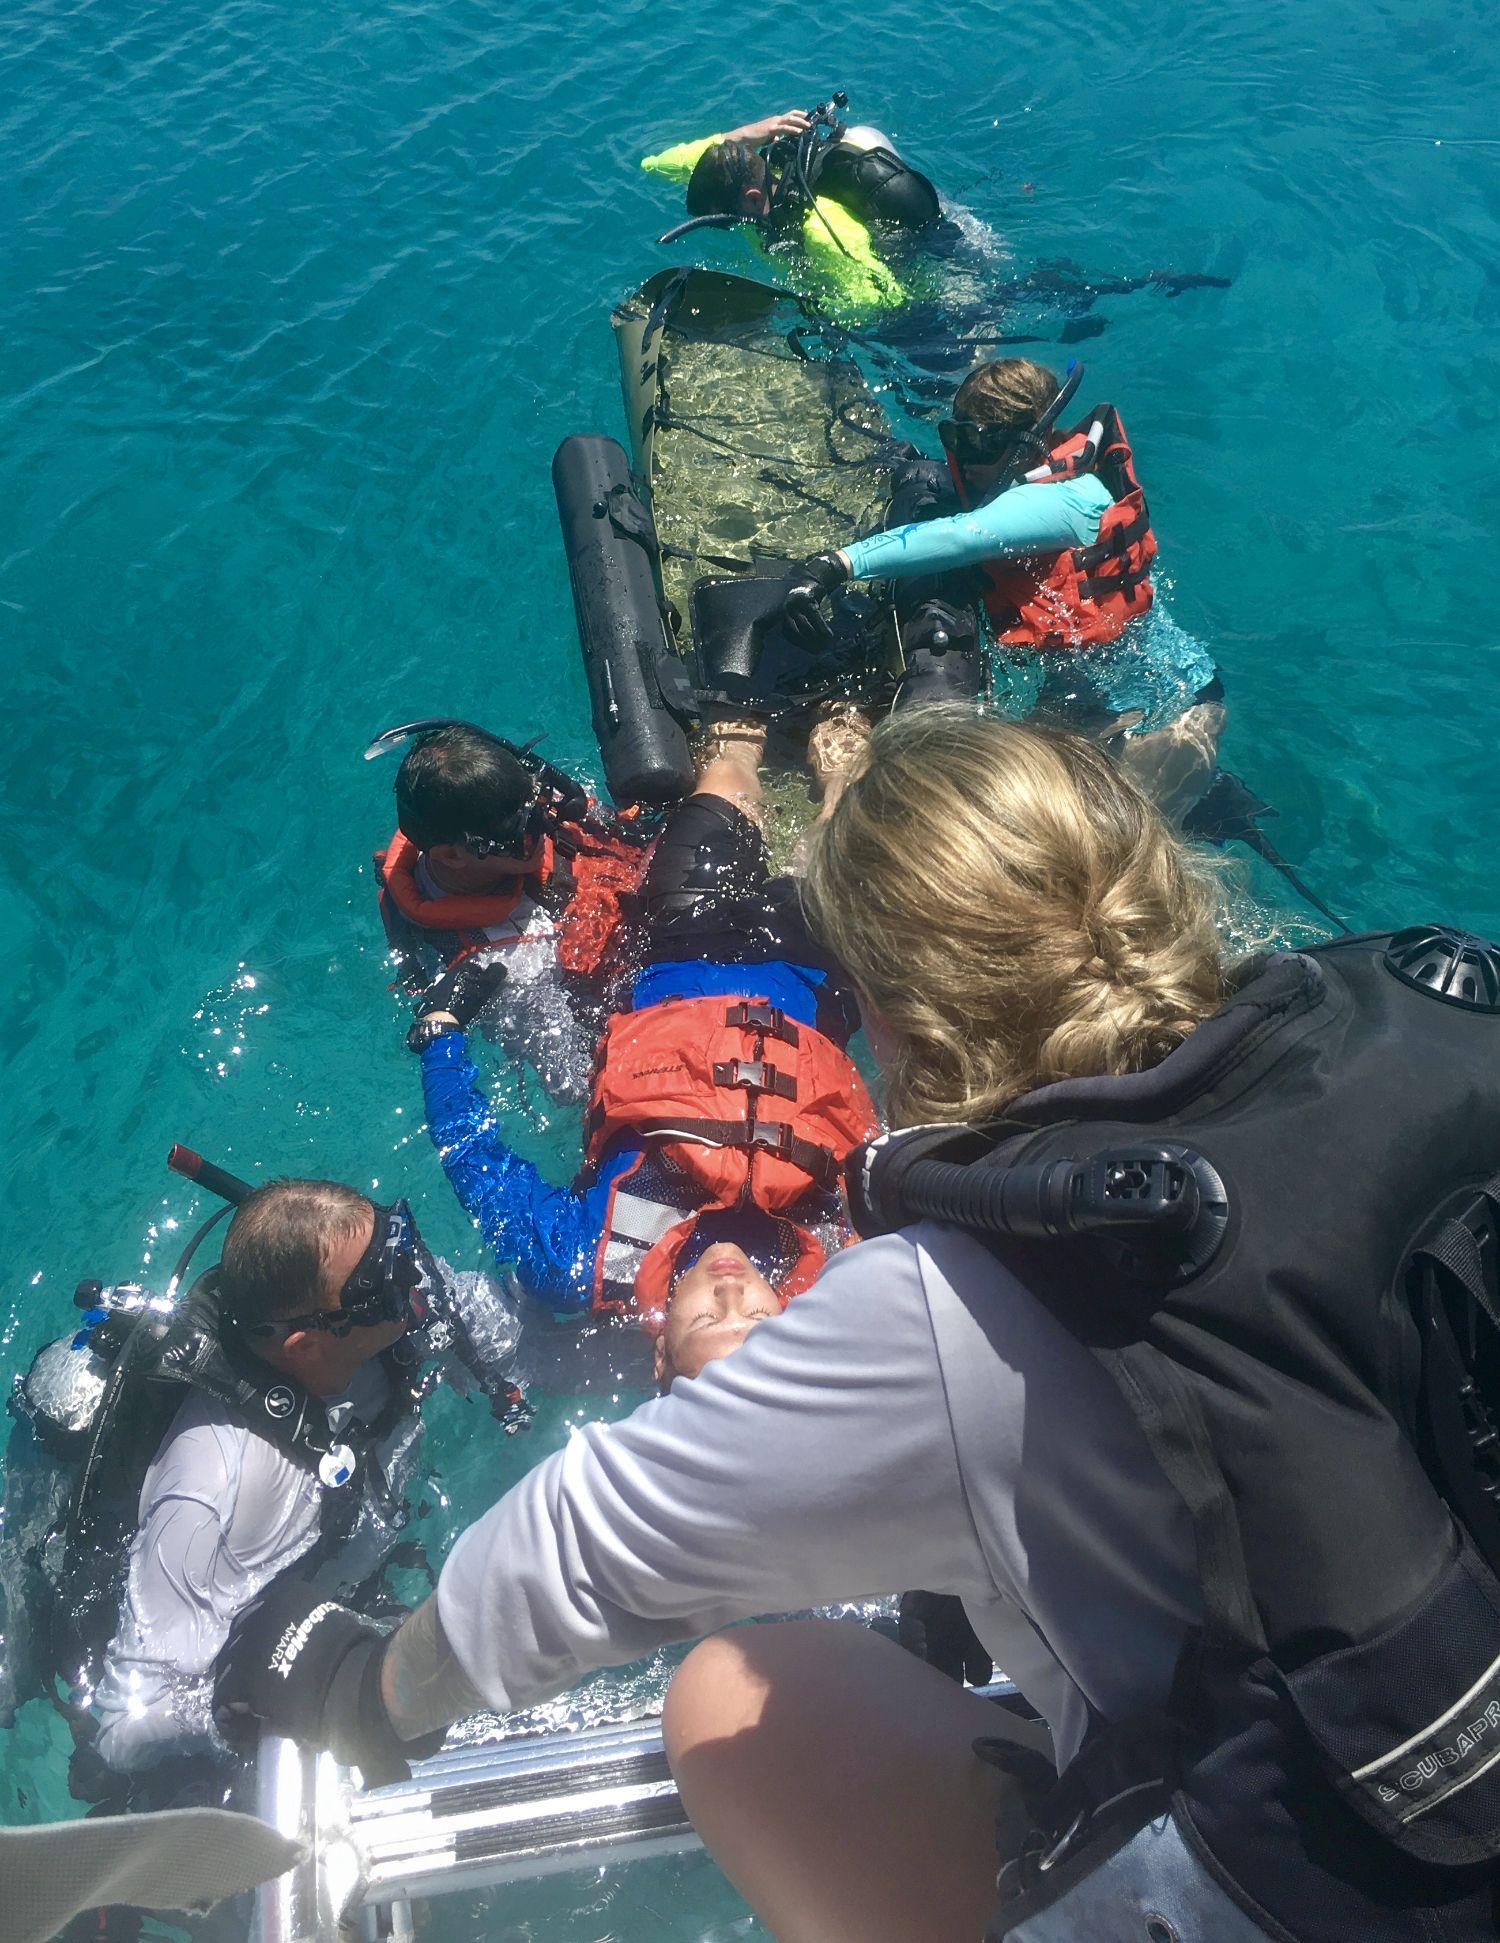 Rescue Dive Medicine Level 2 Course (With images) Rescue